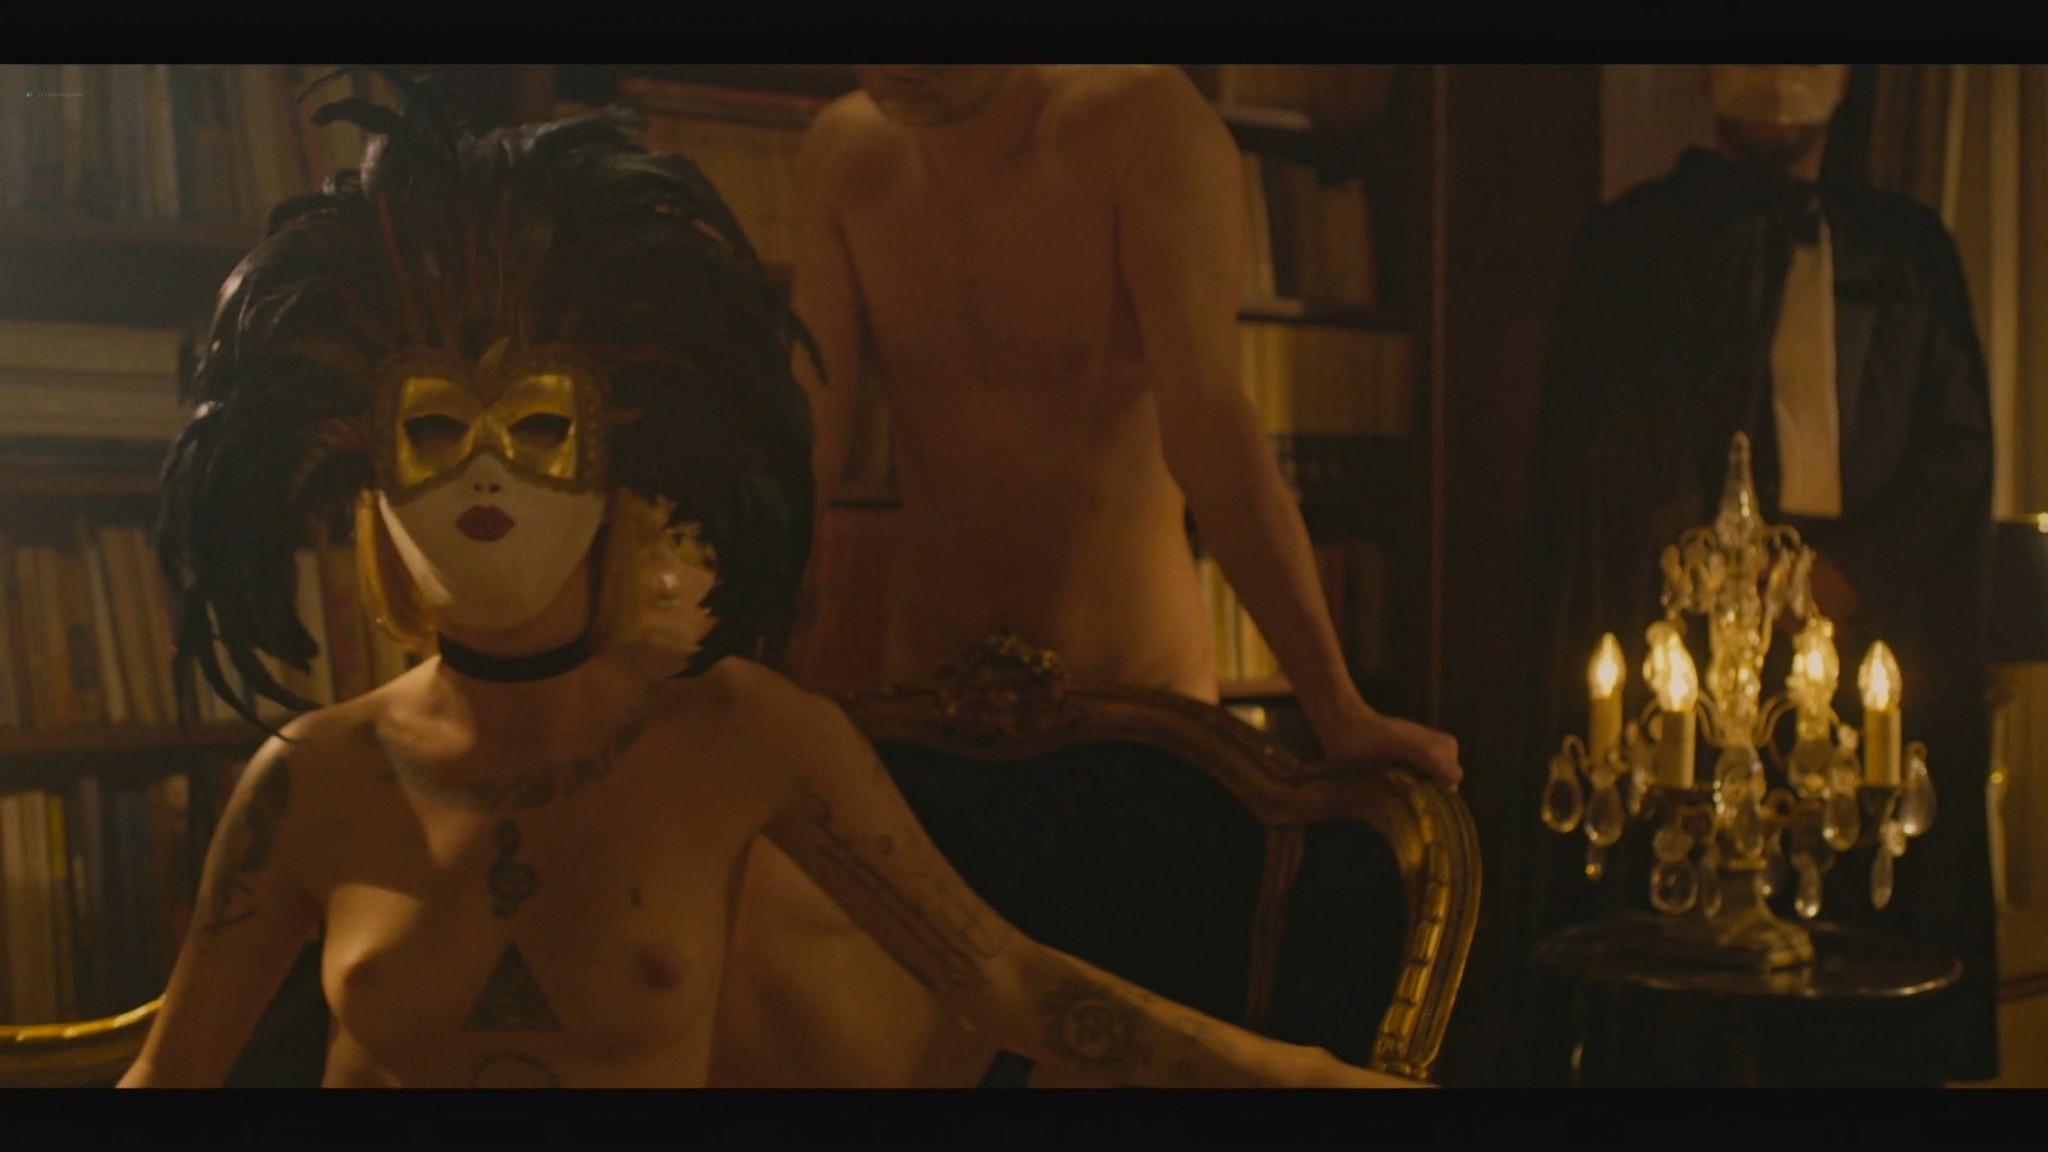 Brunna Martins nude Carolina Ferraz Natalia Lage and others nude orgy and sexy Hard 2021 s3e1 2 1080p Web 17